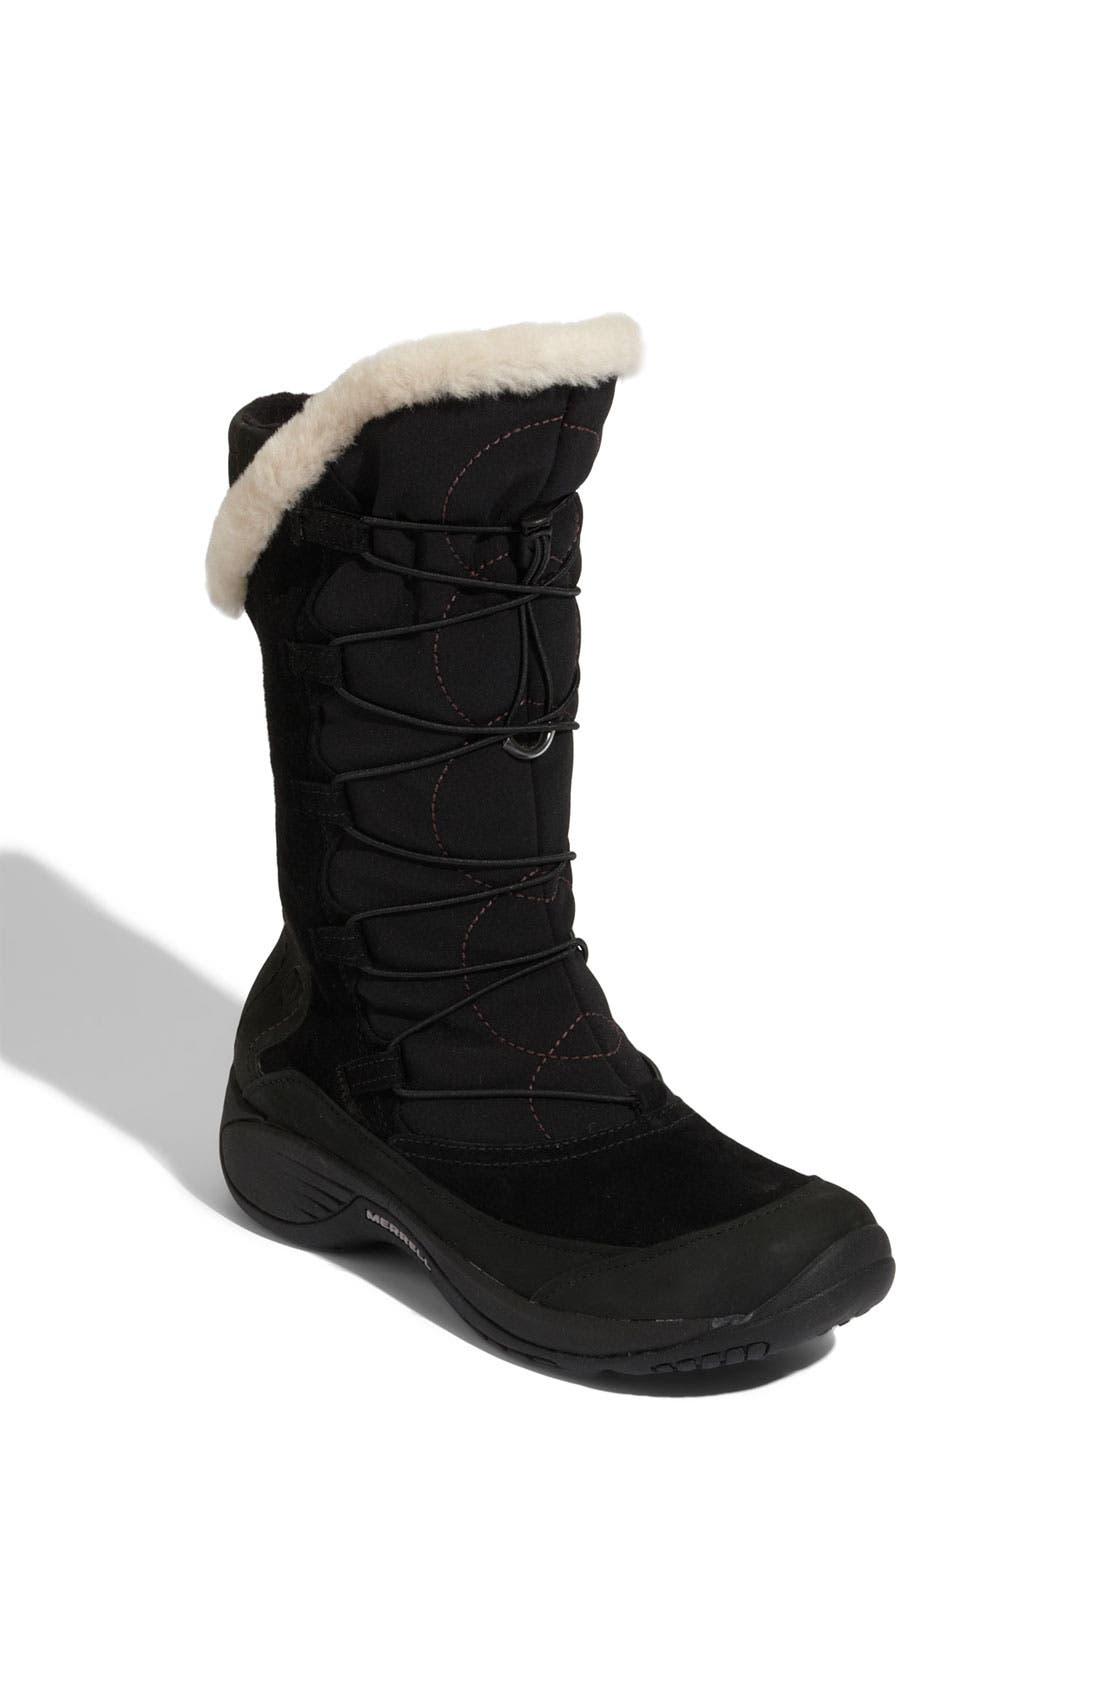 Main Image - Merrell 'Encore Apex' Boot